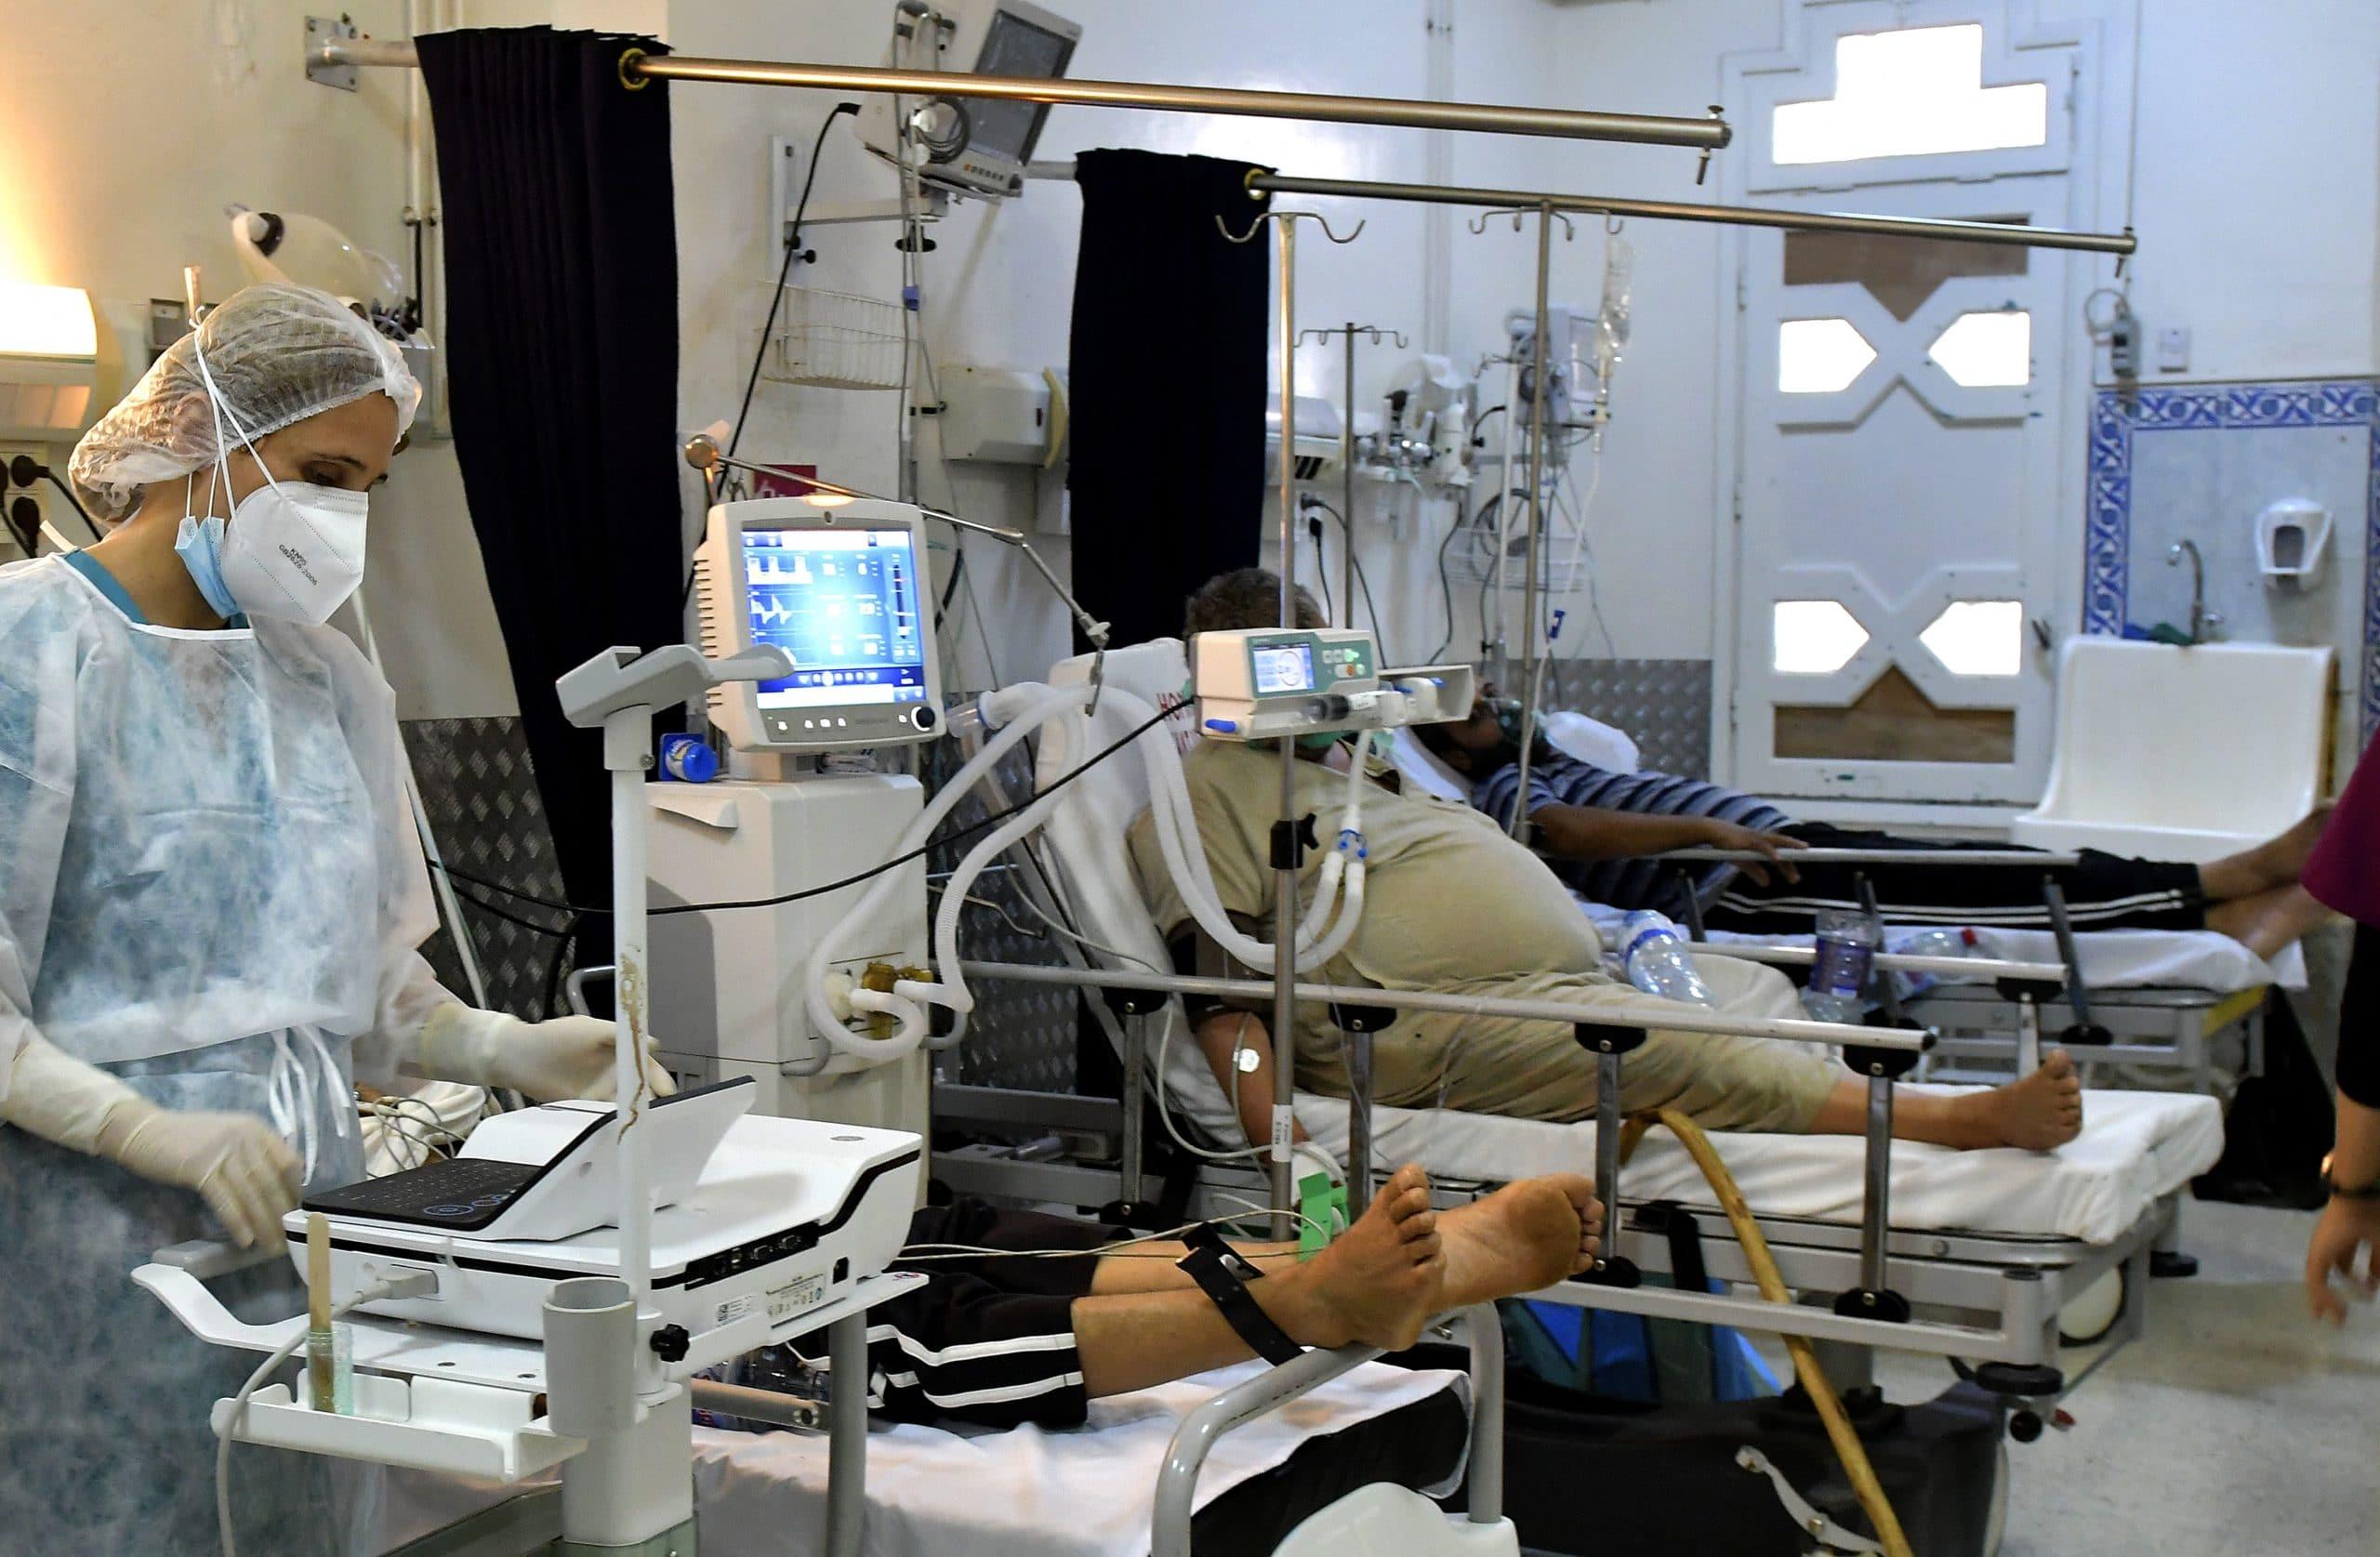 TUNISIA-HEALTH-VIRUS-TOURISM-HOSPITAL